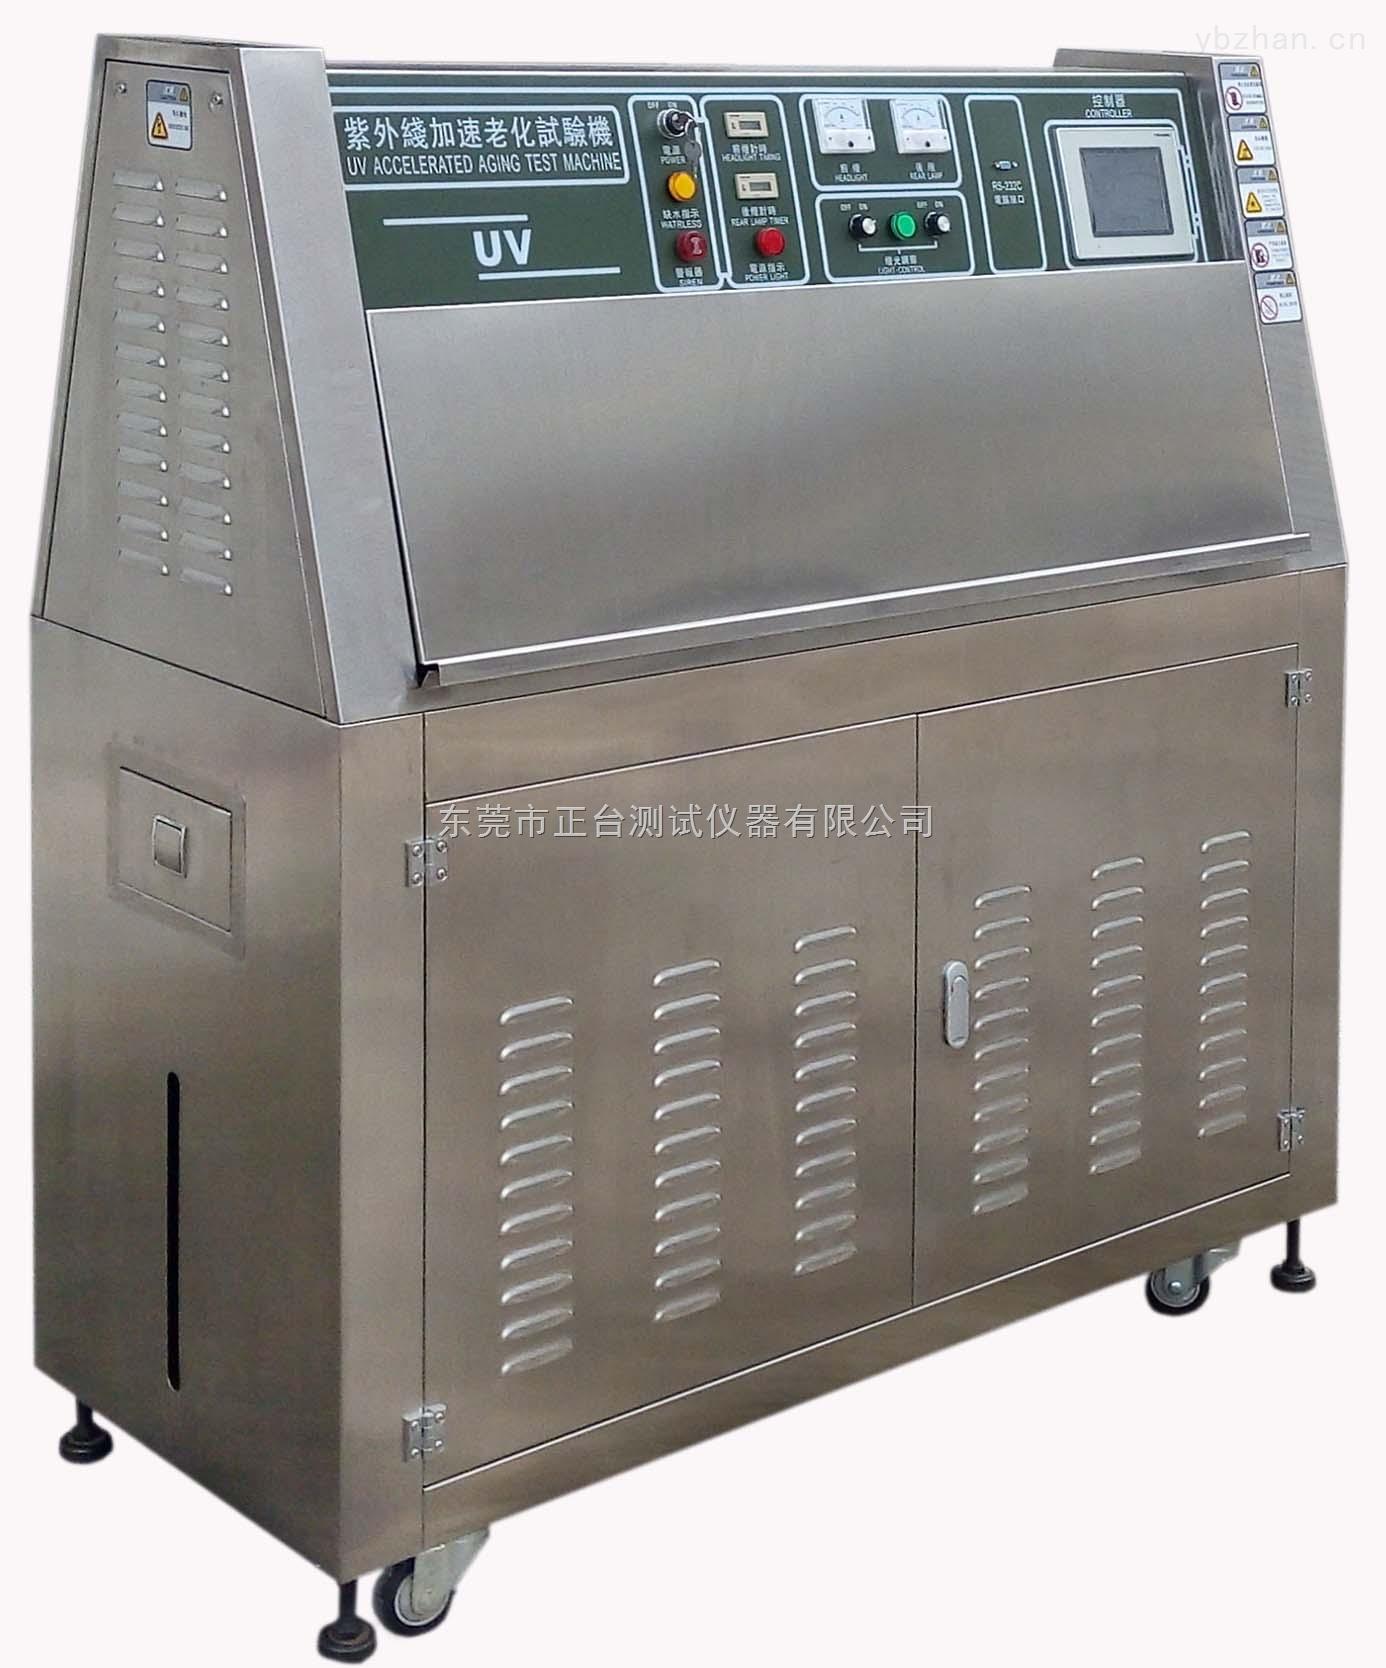 ZT-UV-50S-耐紫外光老化儀/抗紫外試驗箱